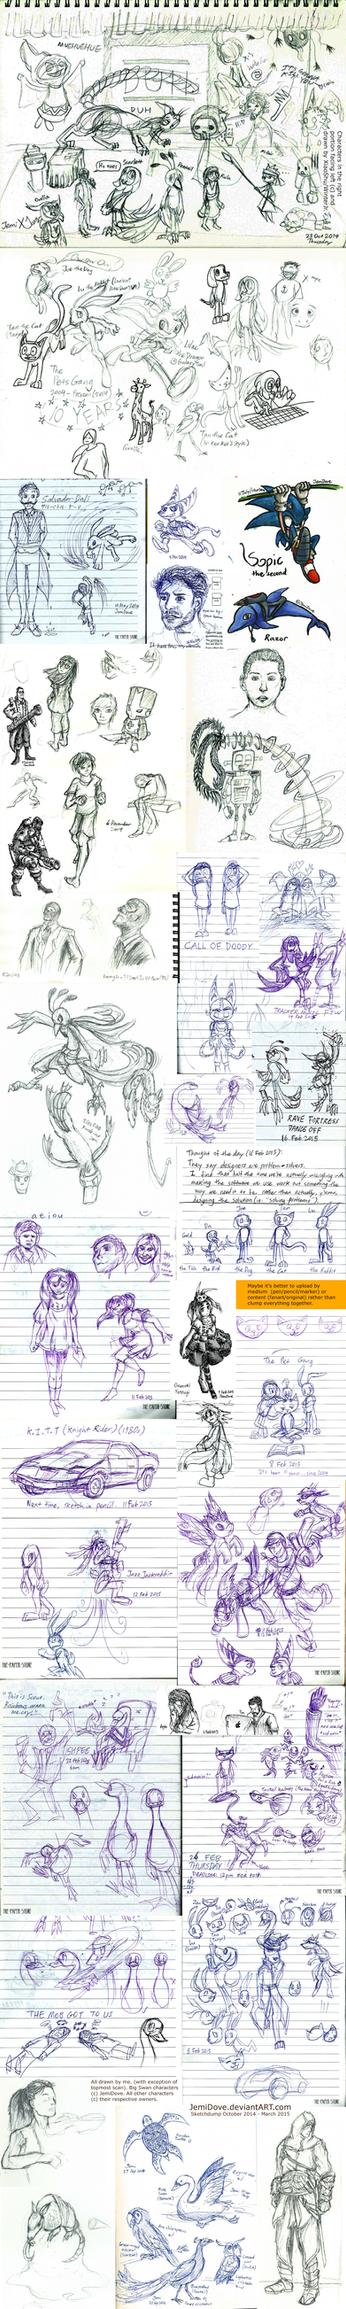 Artdump October2014 - March2015 (need focus) by JemiDove